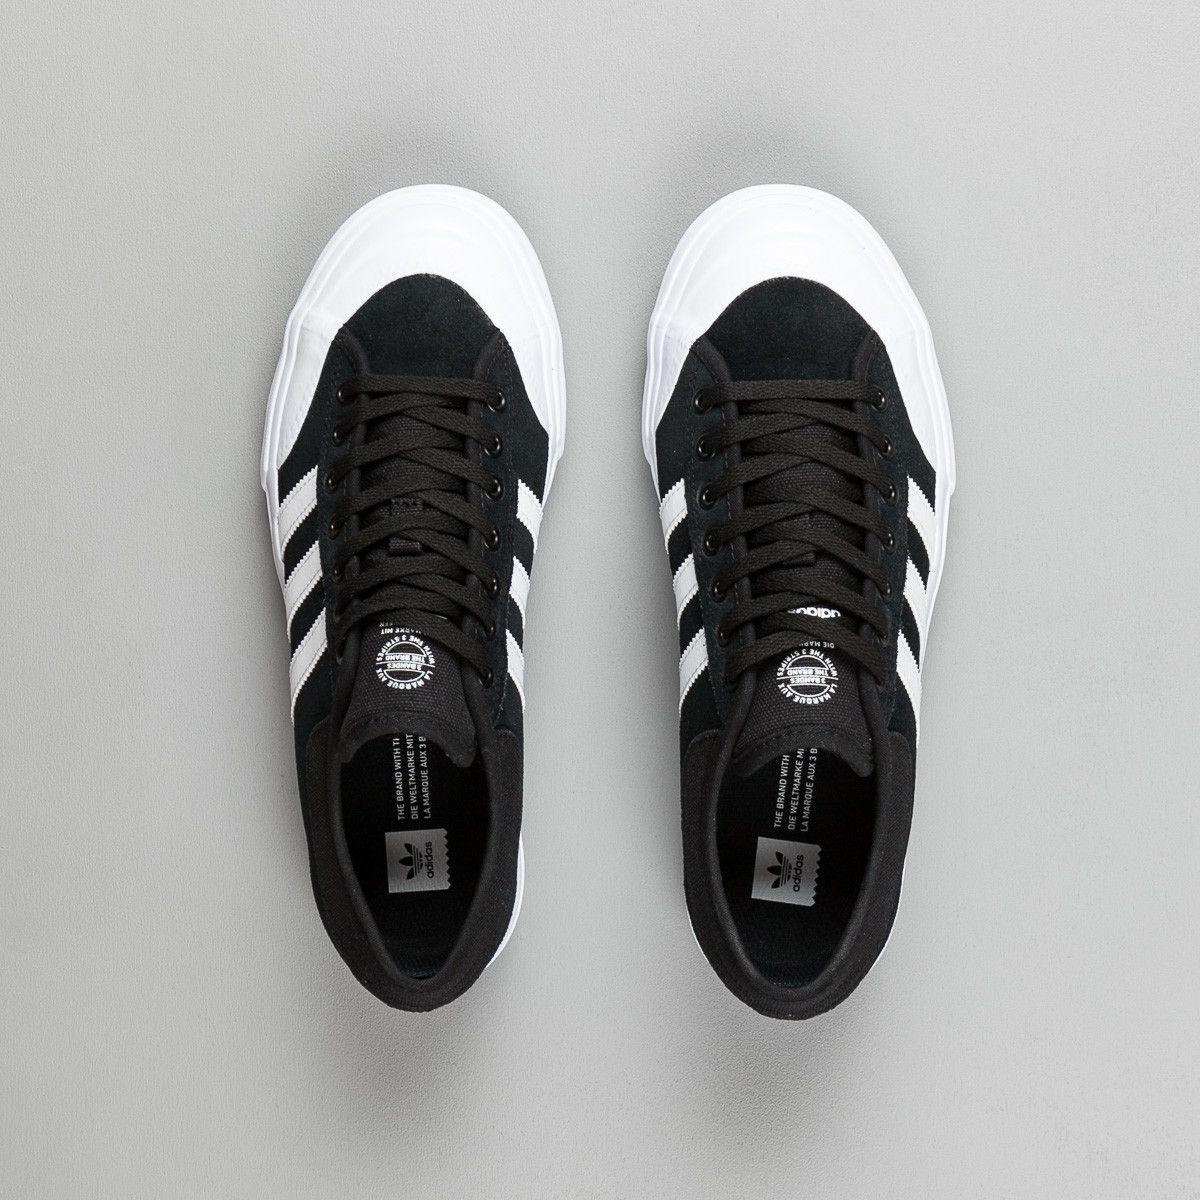 incondicional visto ropa paso  Adidas Matchcourt ADV Shoes - Core Black / White / White | Sneakers, Crazy  shoes, Adidas